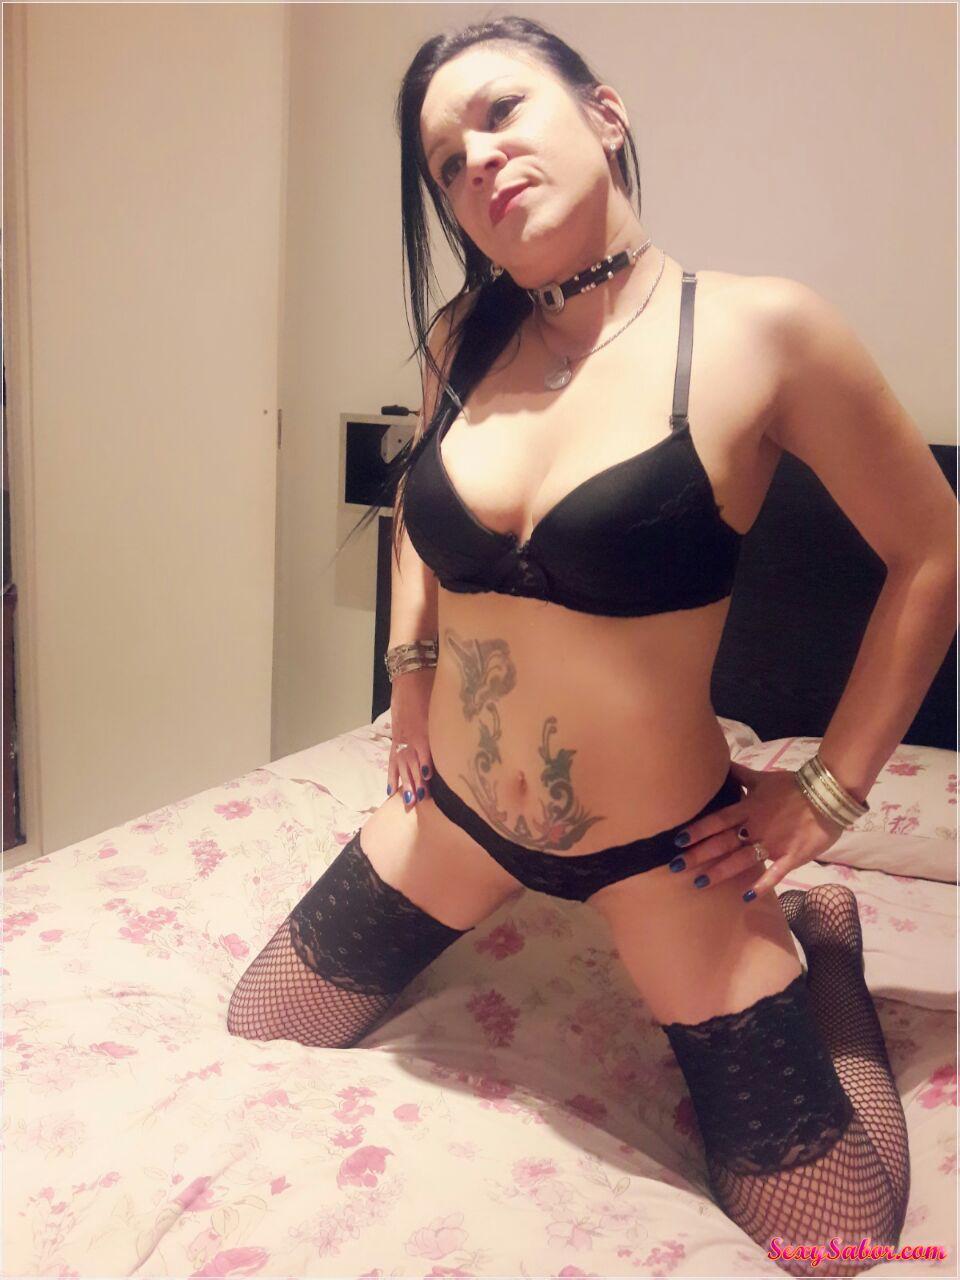 Vikky Hot 15-4928-3883